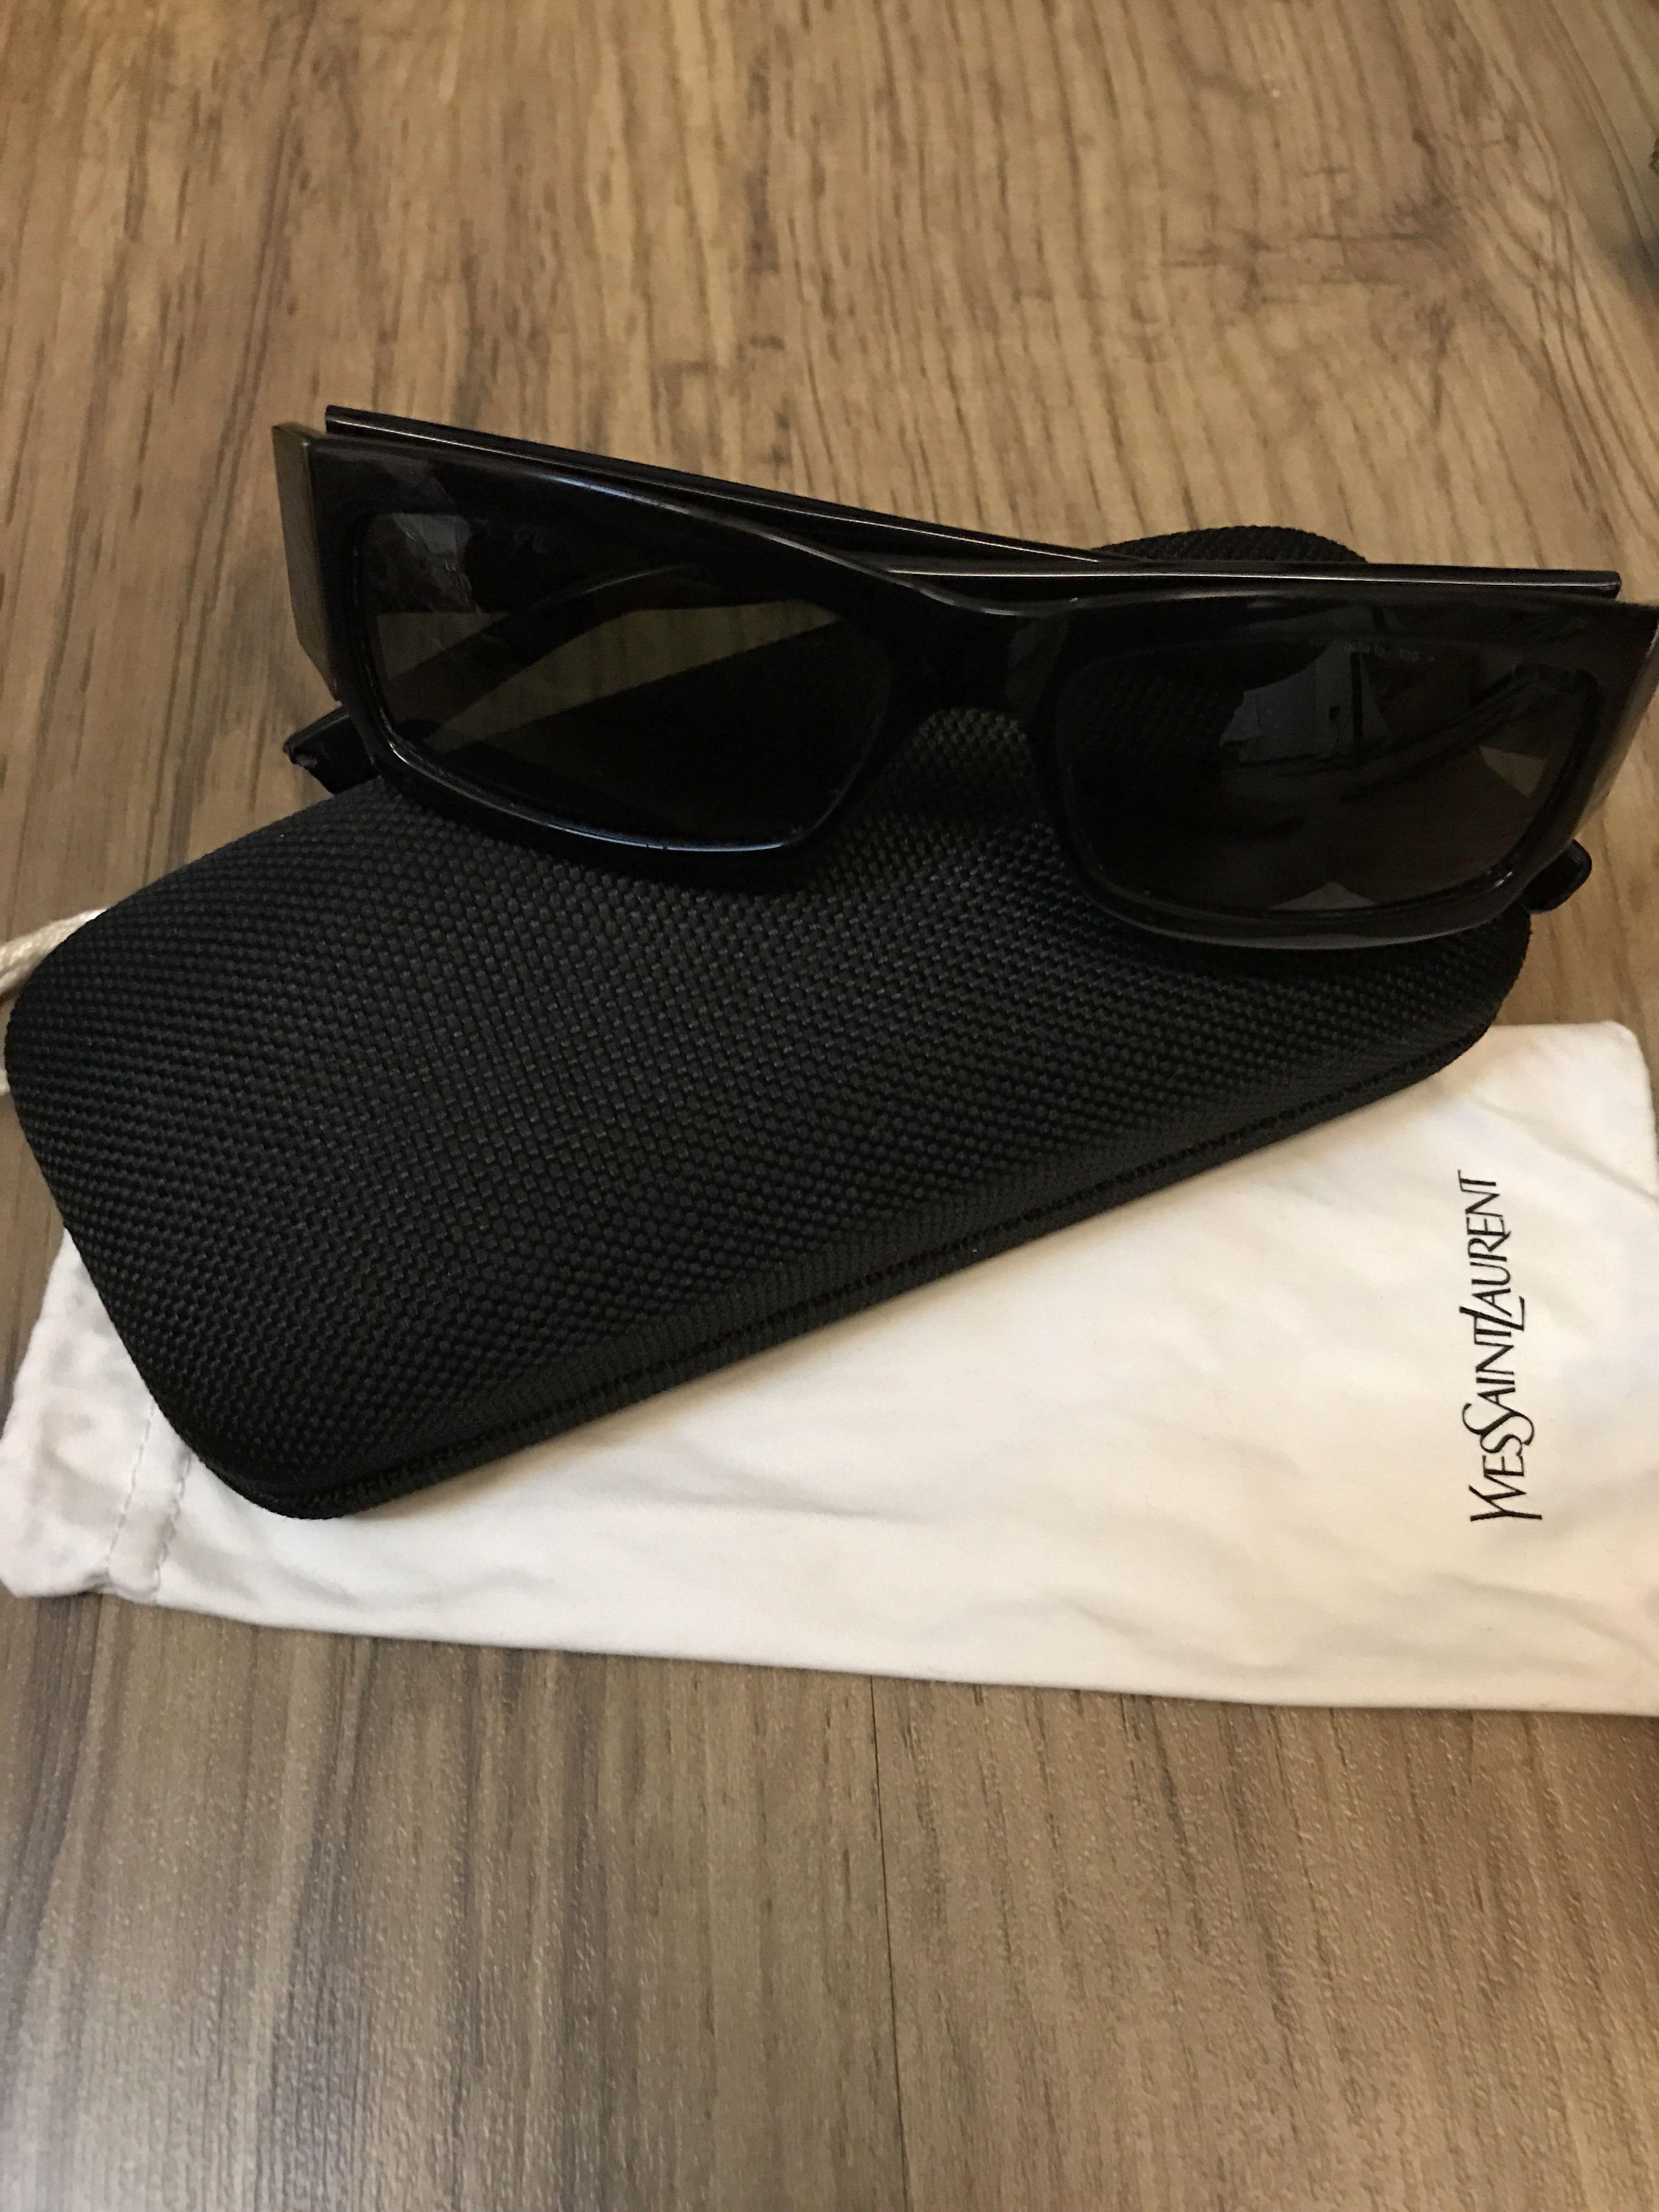 Authentic Women's Ysl Sunglasses Ysl Authentic Women's 0wOnk8PX